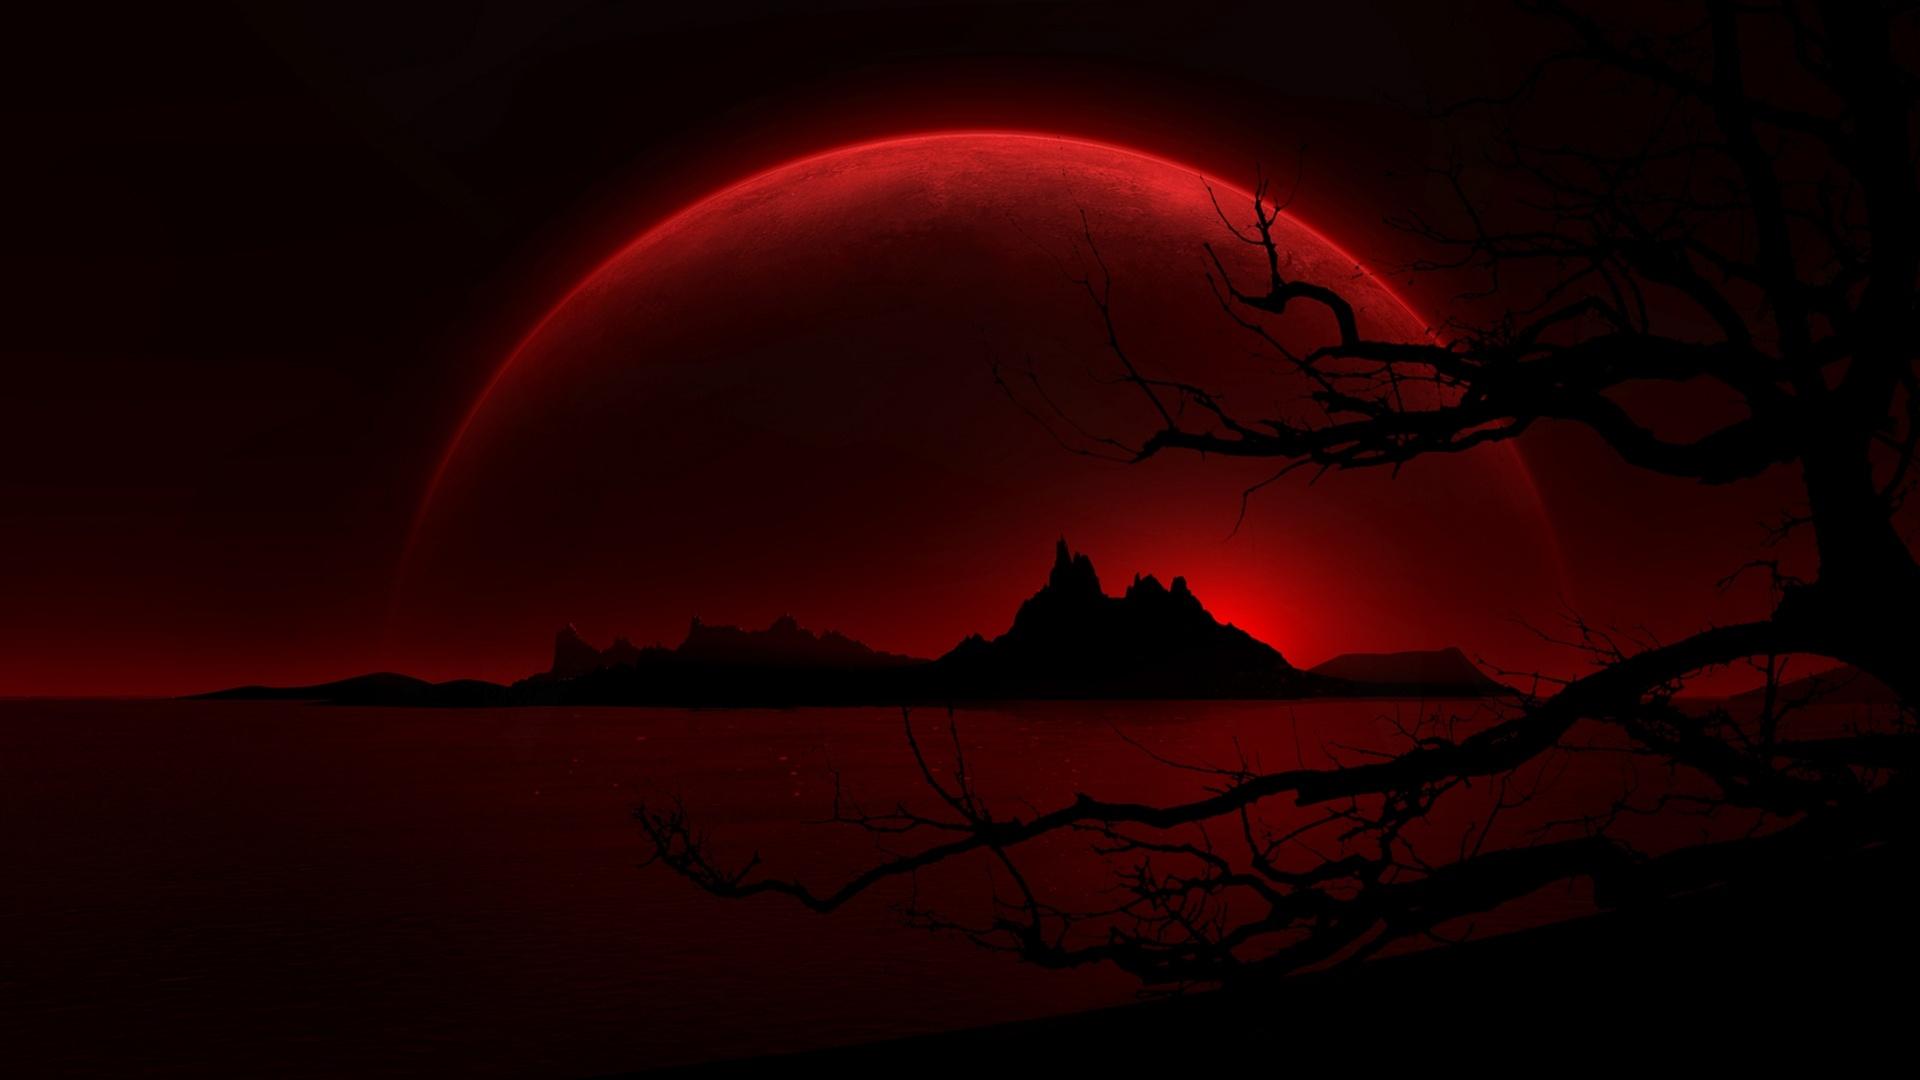 Red Moon Wallpaper 3443 Hd Wallpapers